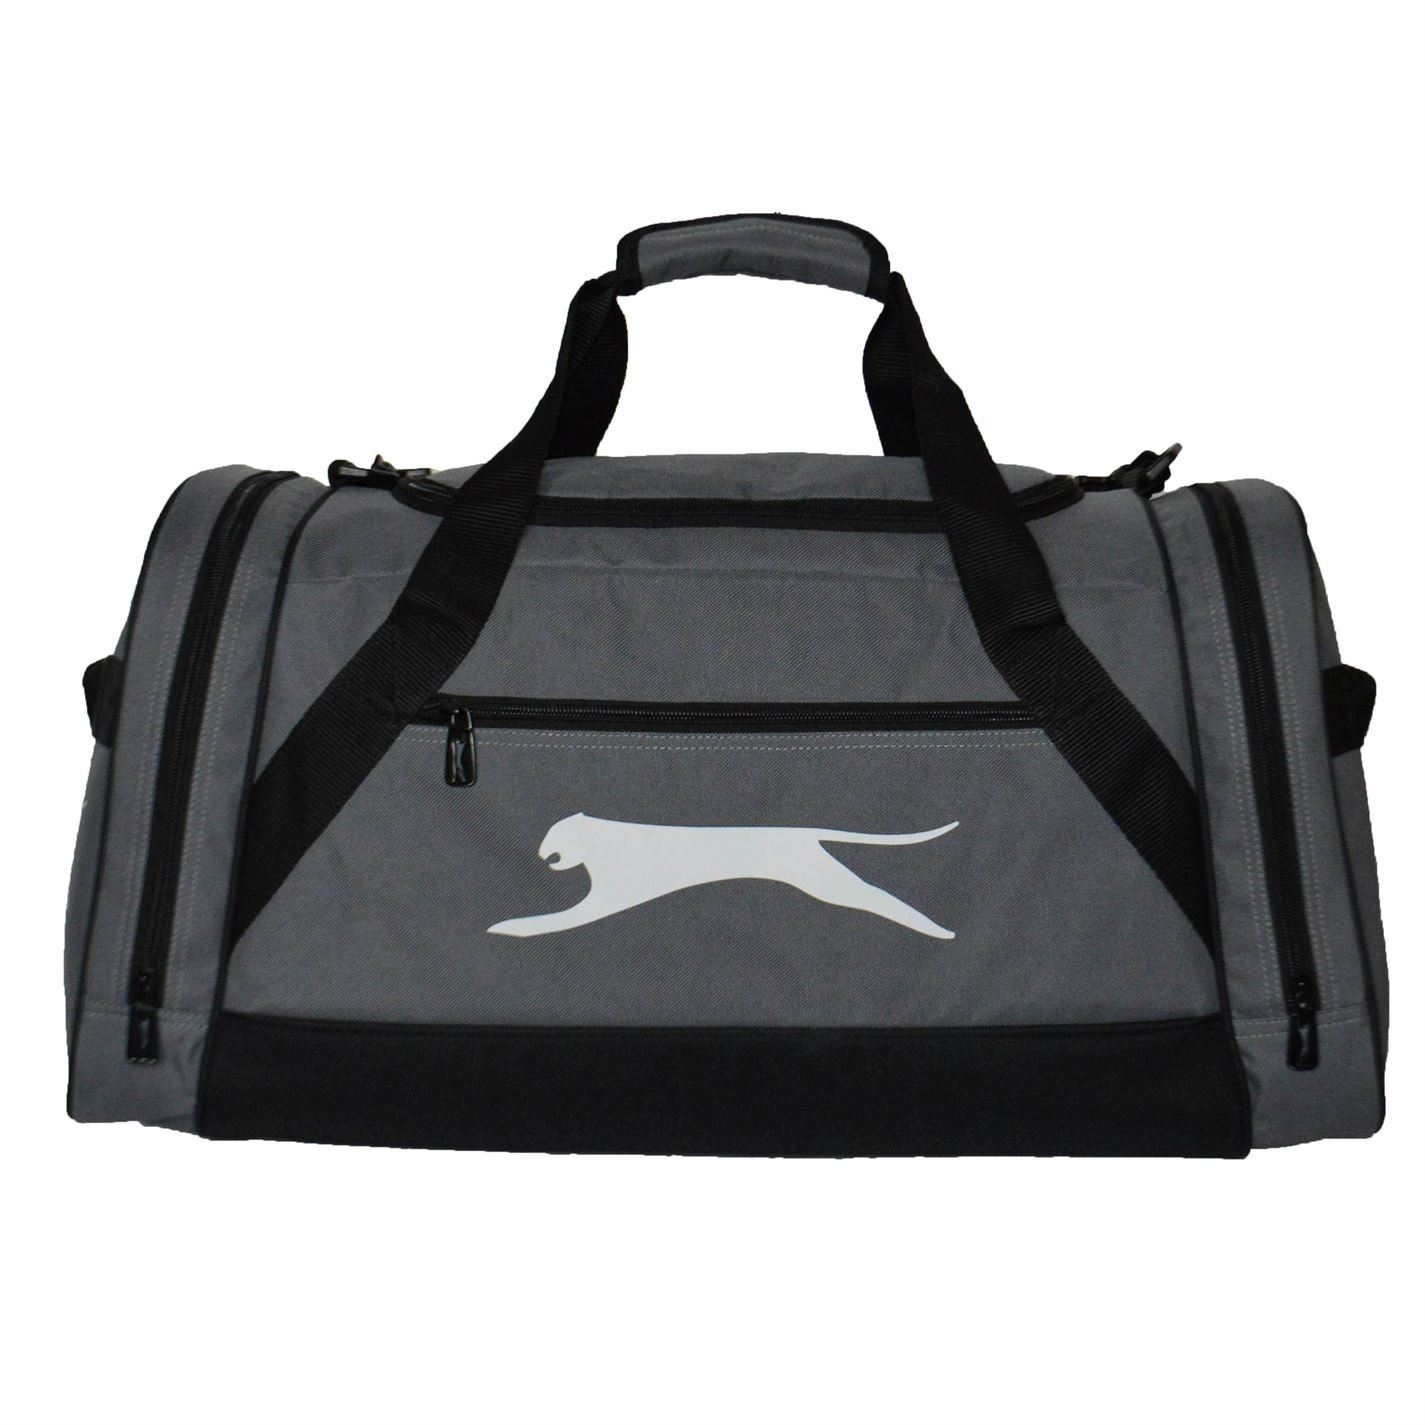 ... Slazenger Large Sports Holdall Charcoal Gym Kit Bag Carryall ... 72c298adbf3d0